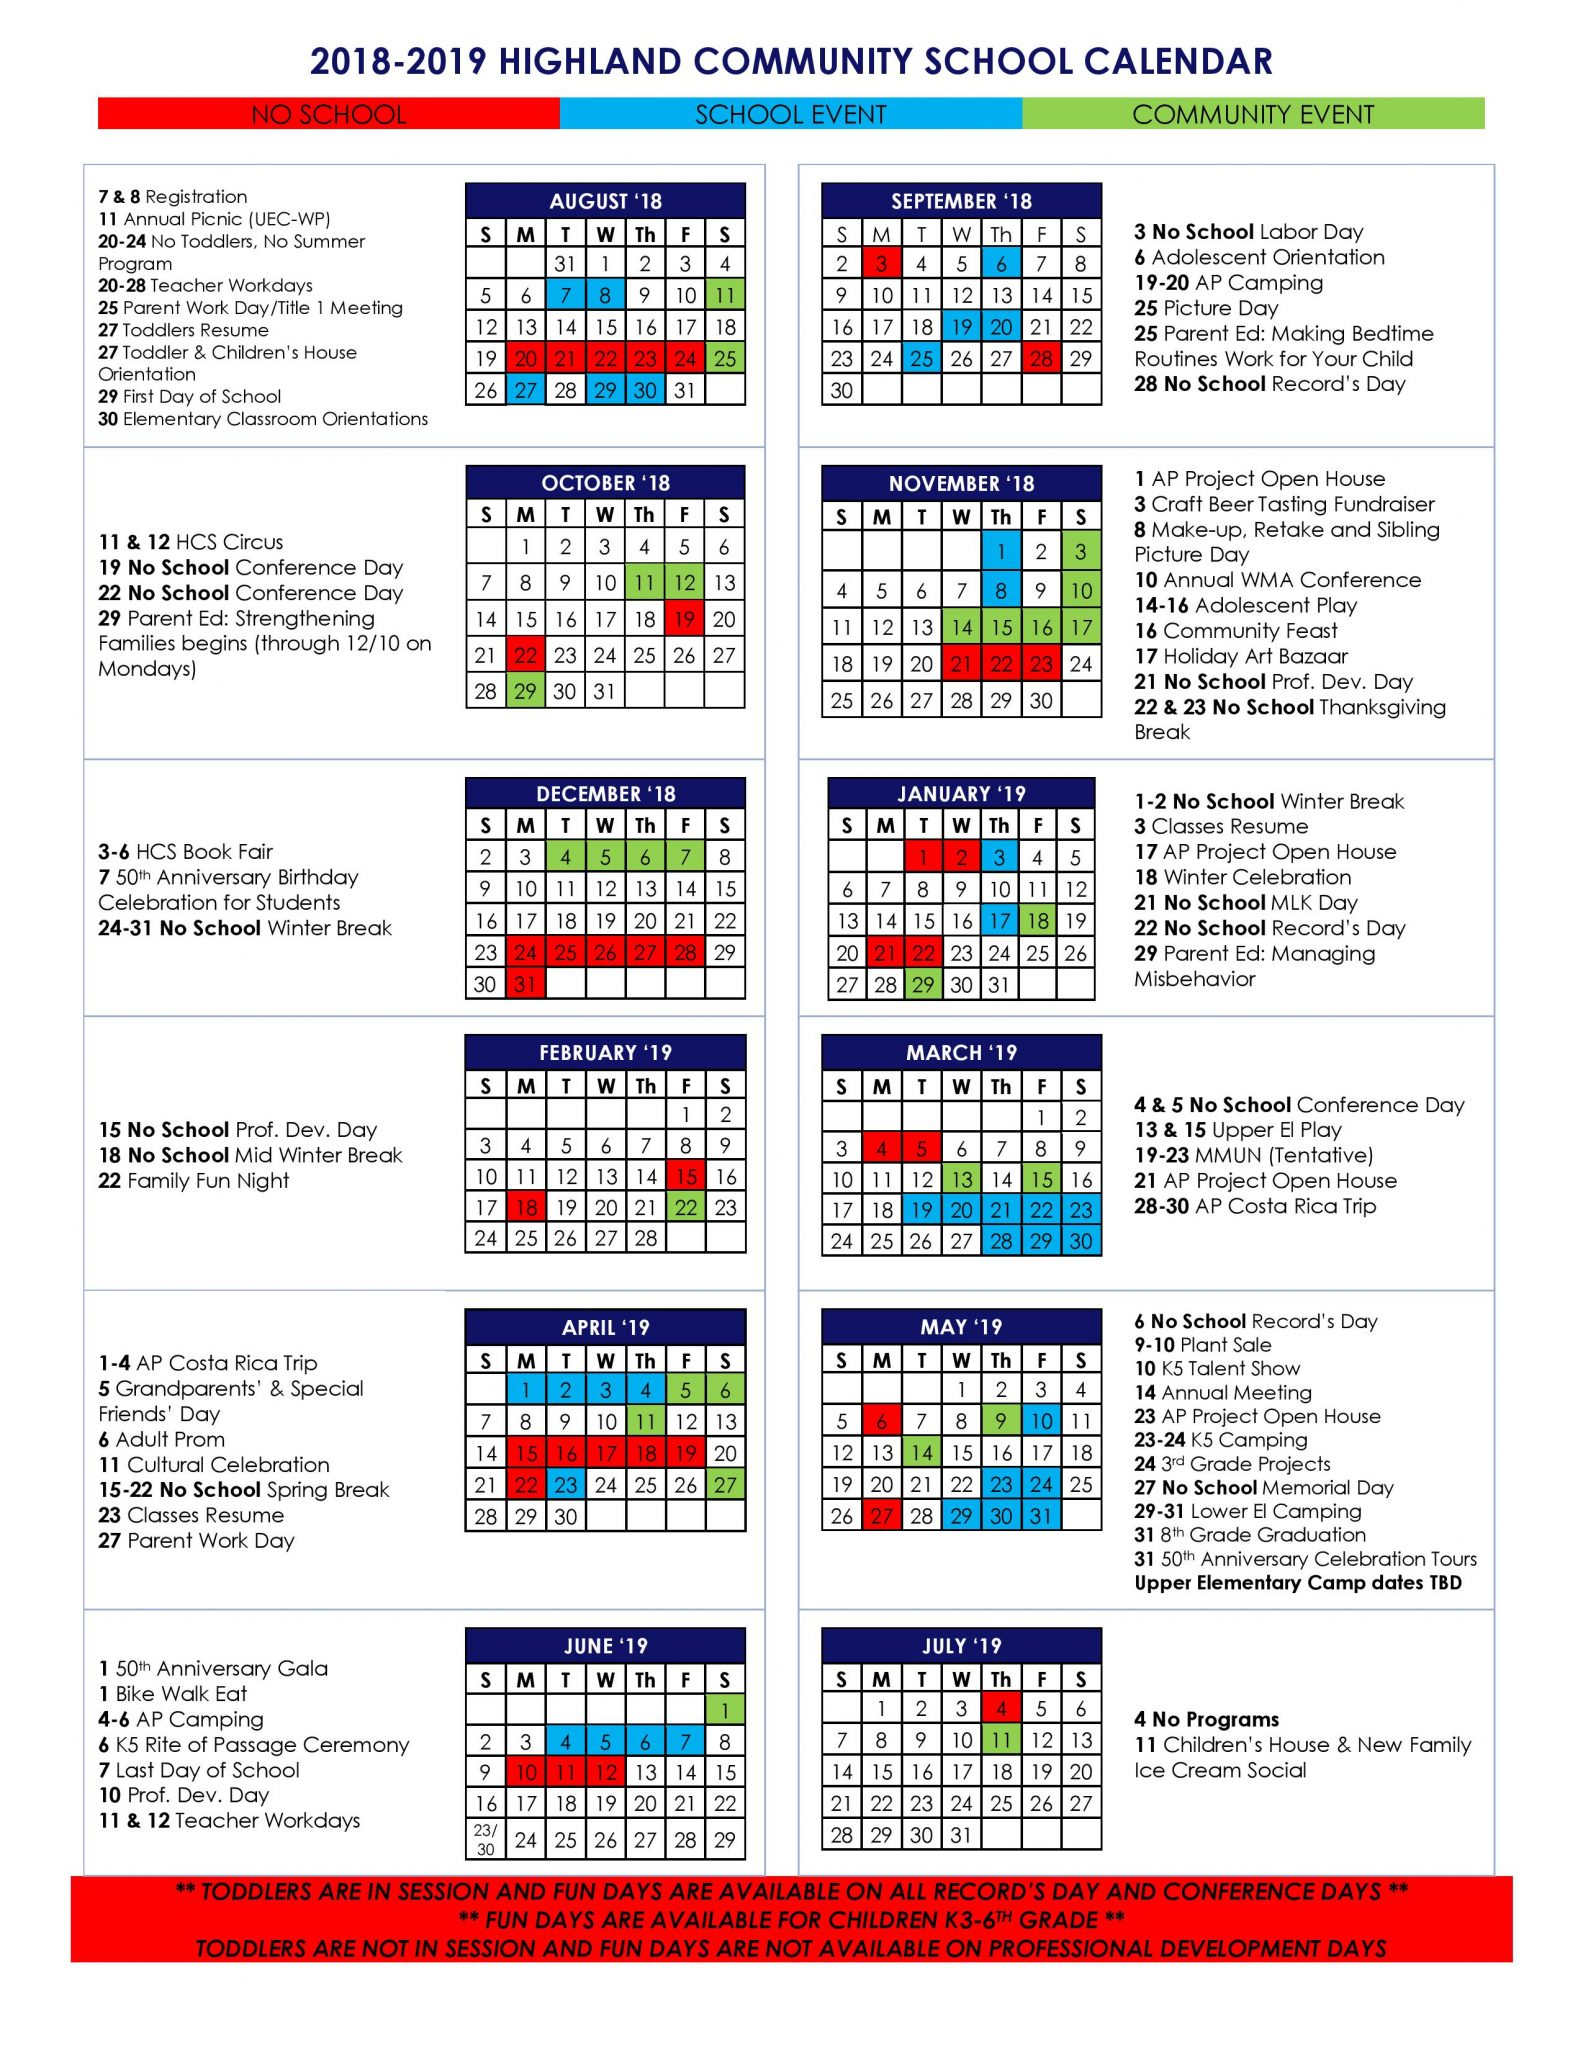 Events Calendar Highland Community School